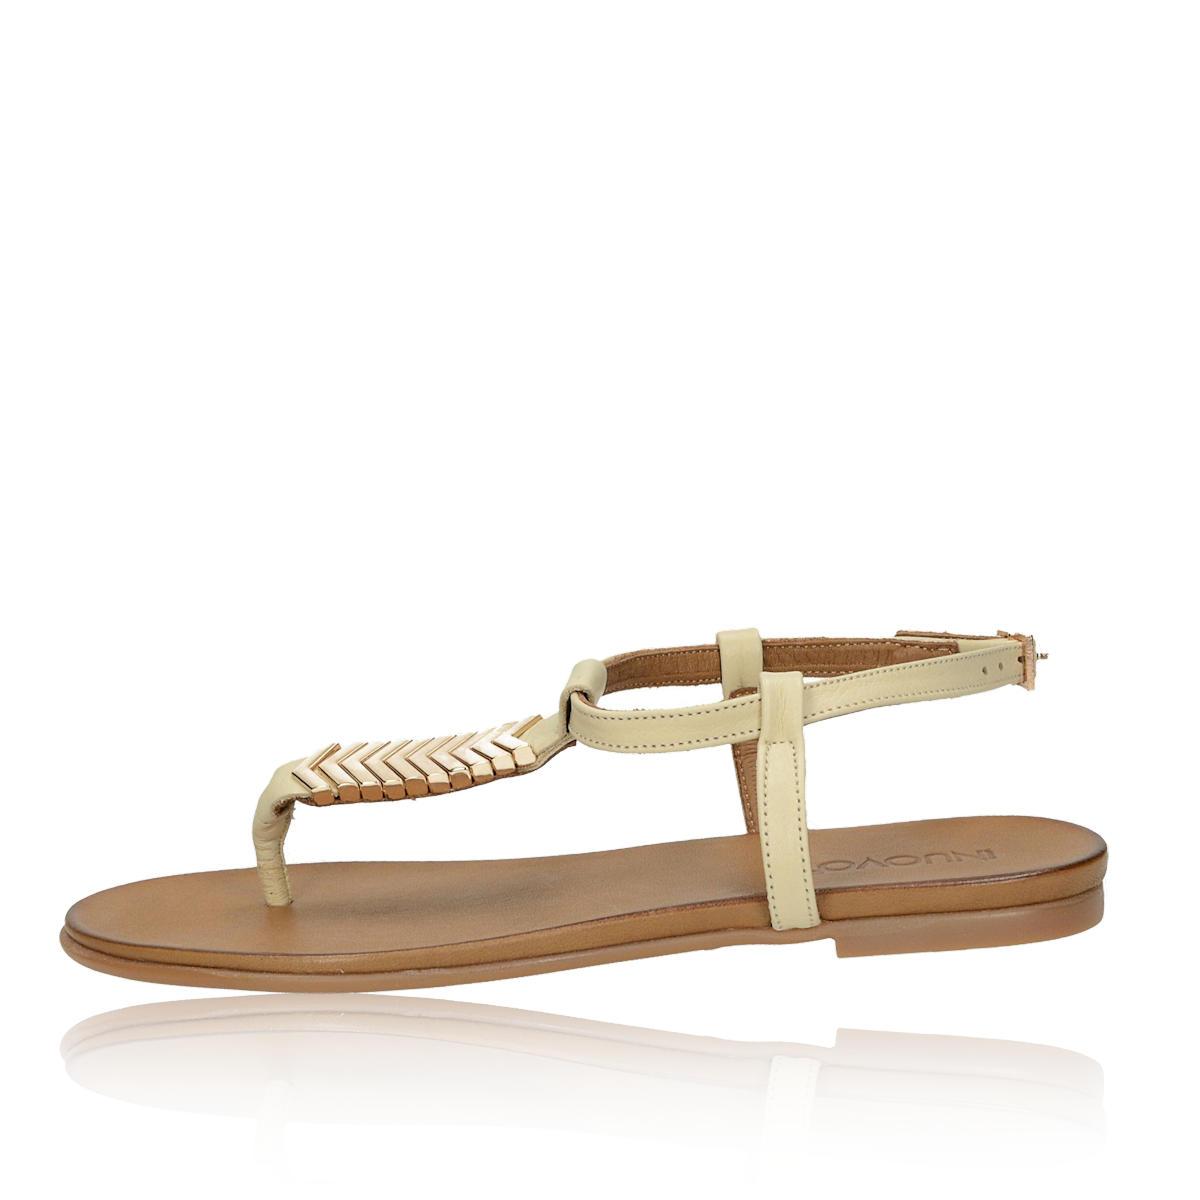 ab42ecd7570a6 Inuovo dámske luxusné sandále - béžové Inuovo dámske luxusné sandále -  béžové ...